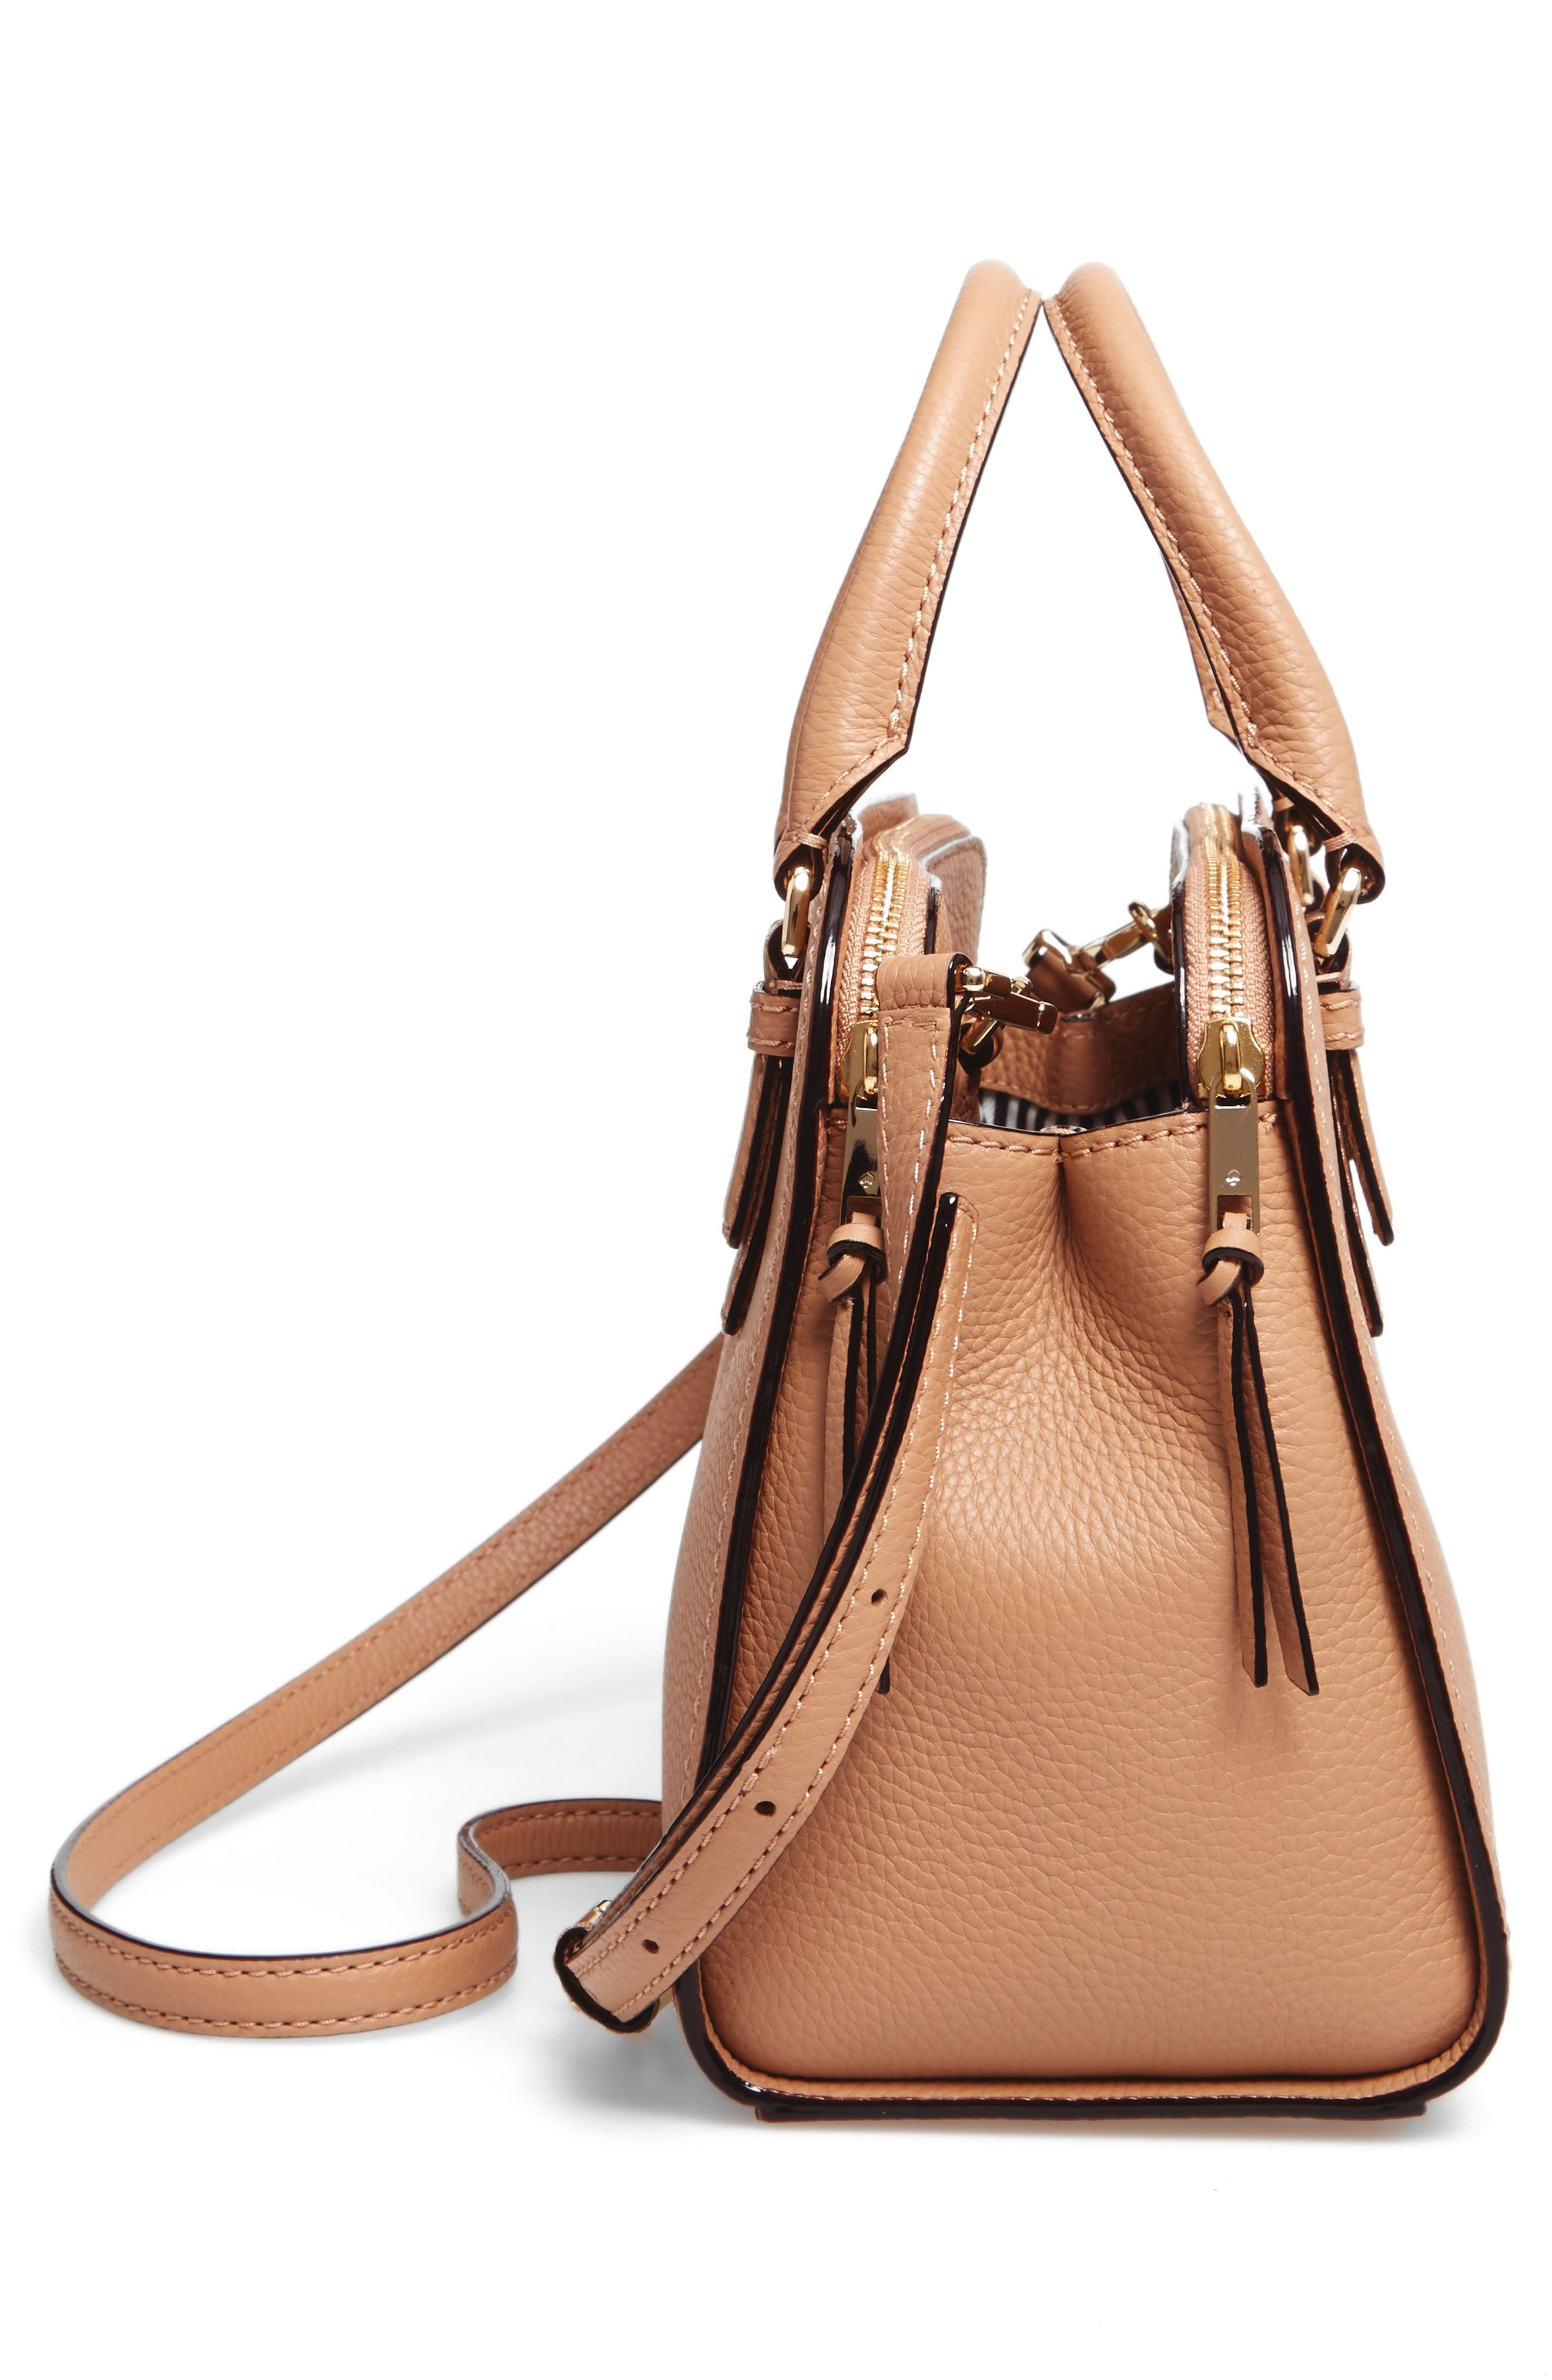 jackson street small kiernan leather top handle satchel,                             Alternate thumbnail 5, color,                             Hazel